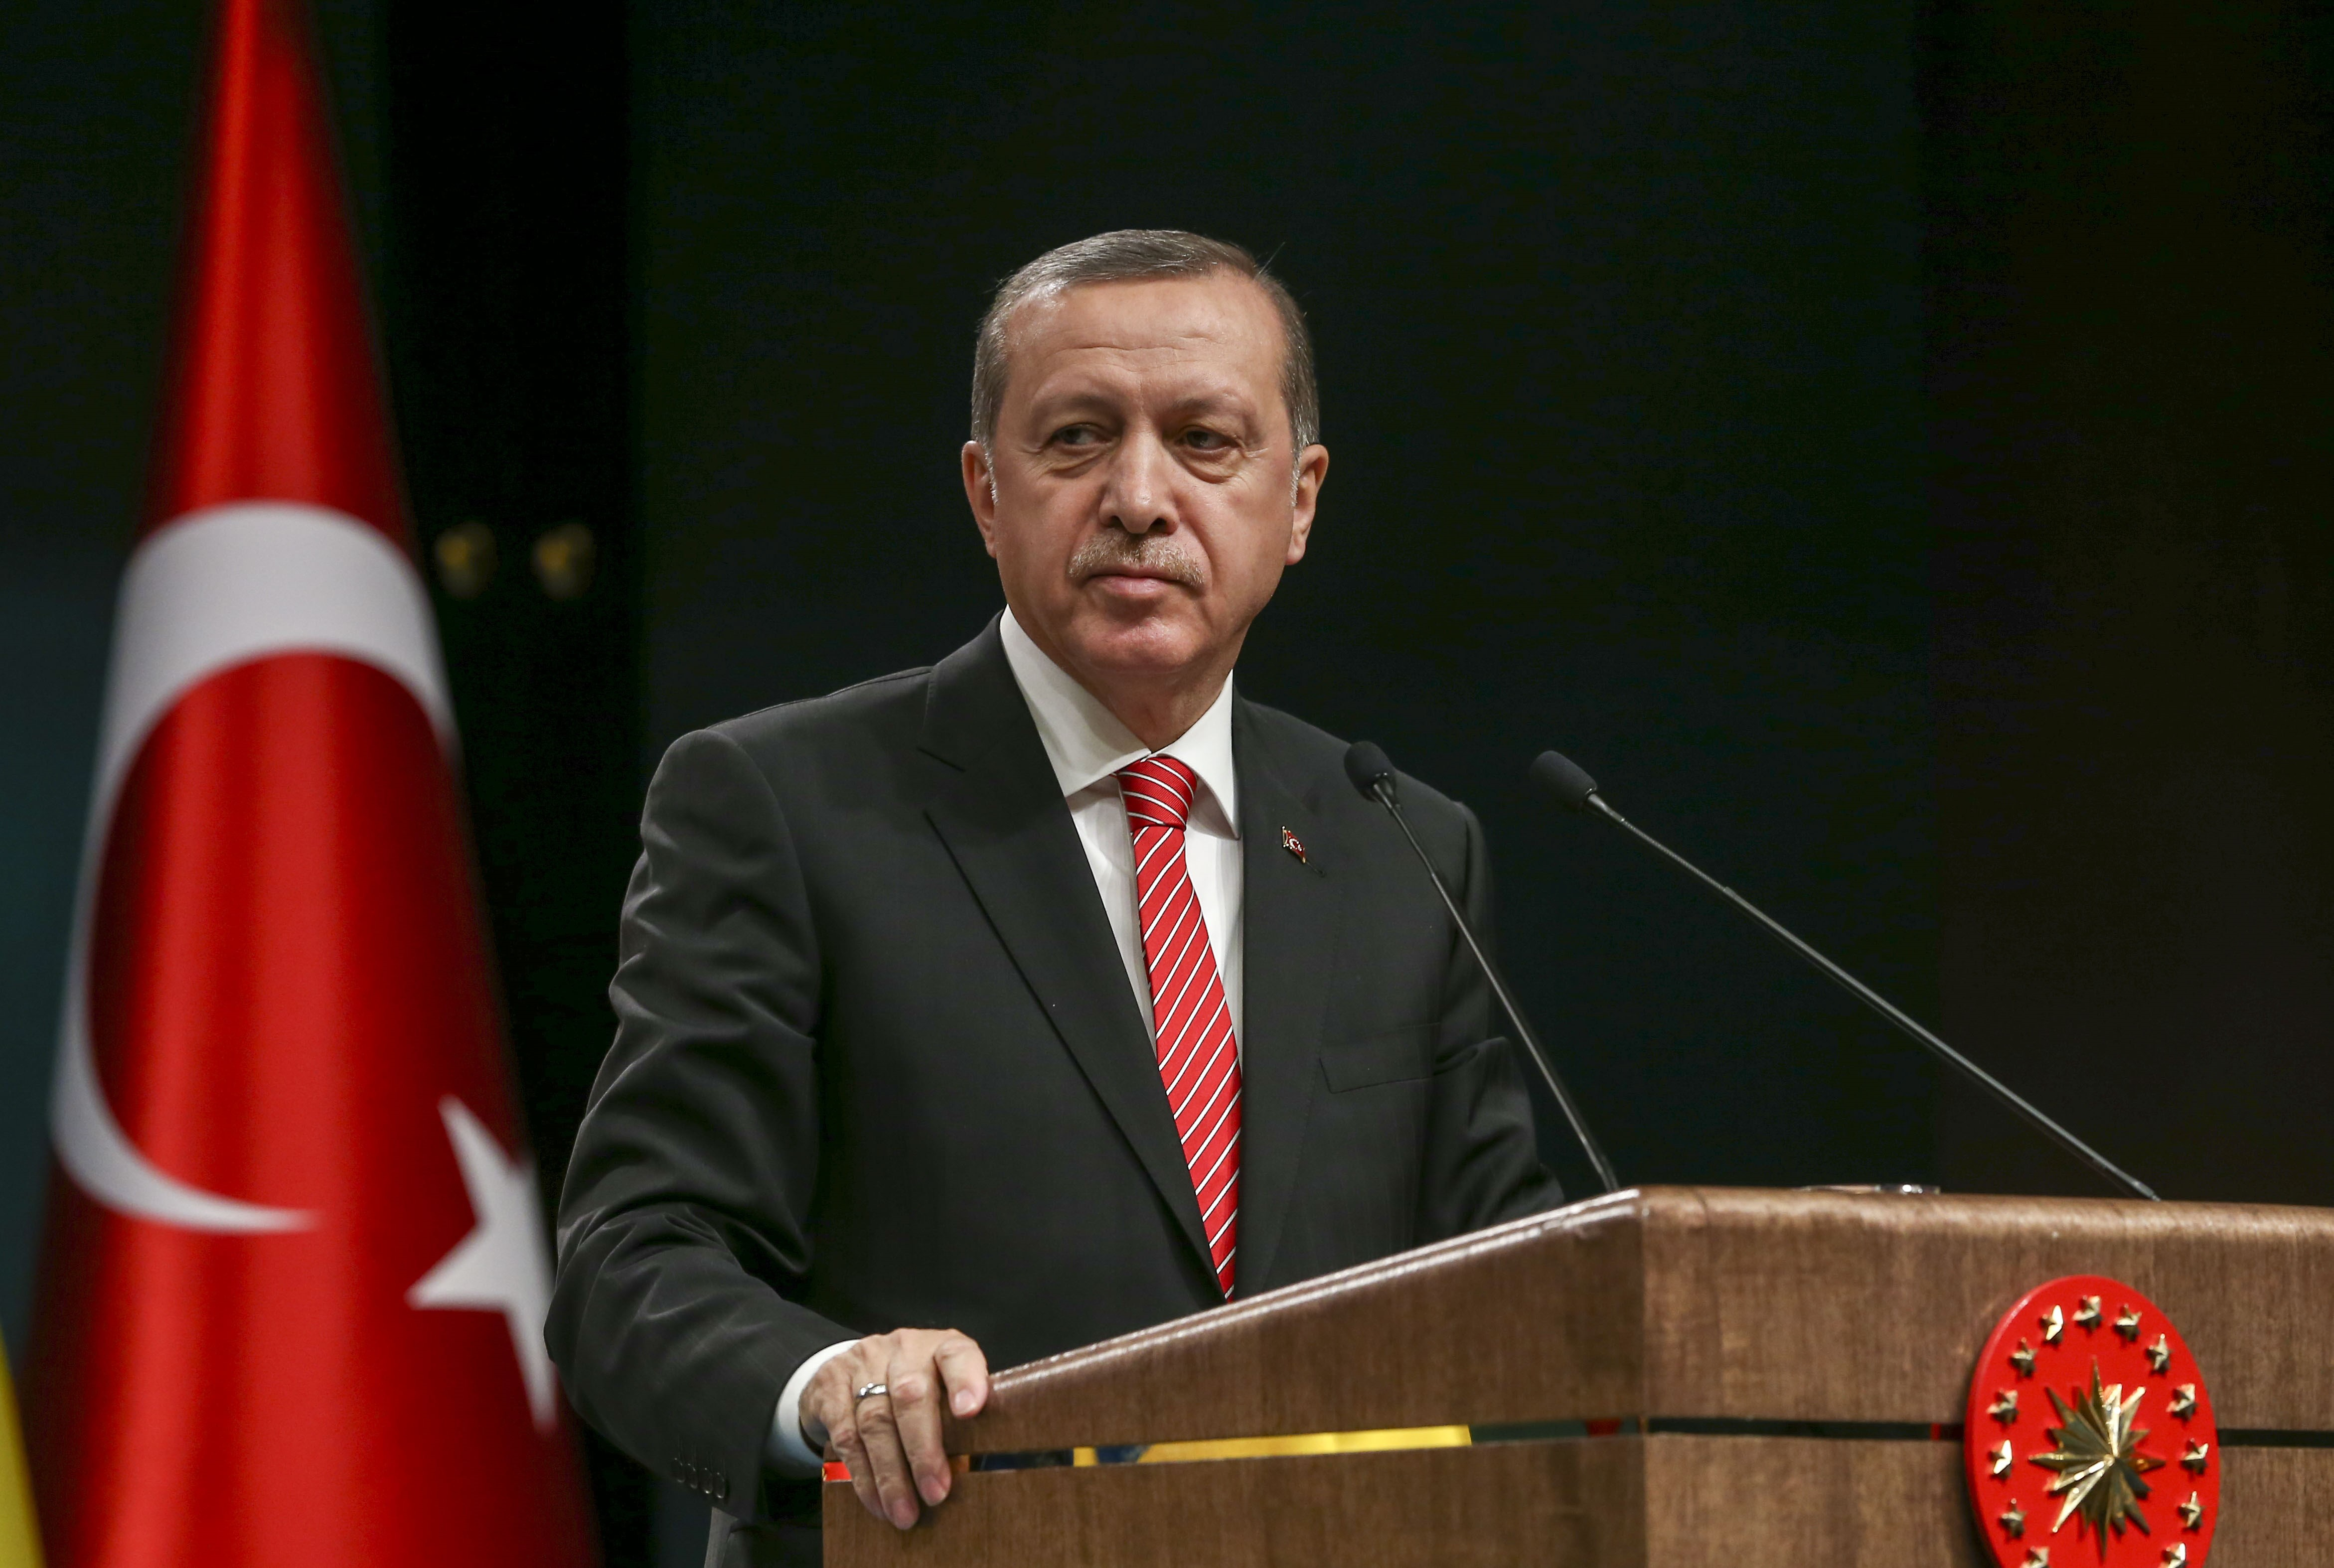 President of Turkey Recep Tayyip Erdogan at a press conference after the 5th Turkey-Ukraine High Level Strategic Council Meeting in Ankara, Turkey on March 9, 2016.